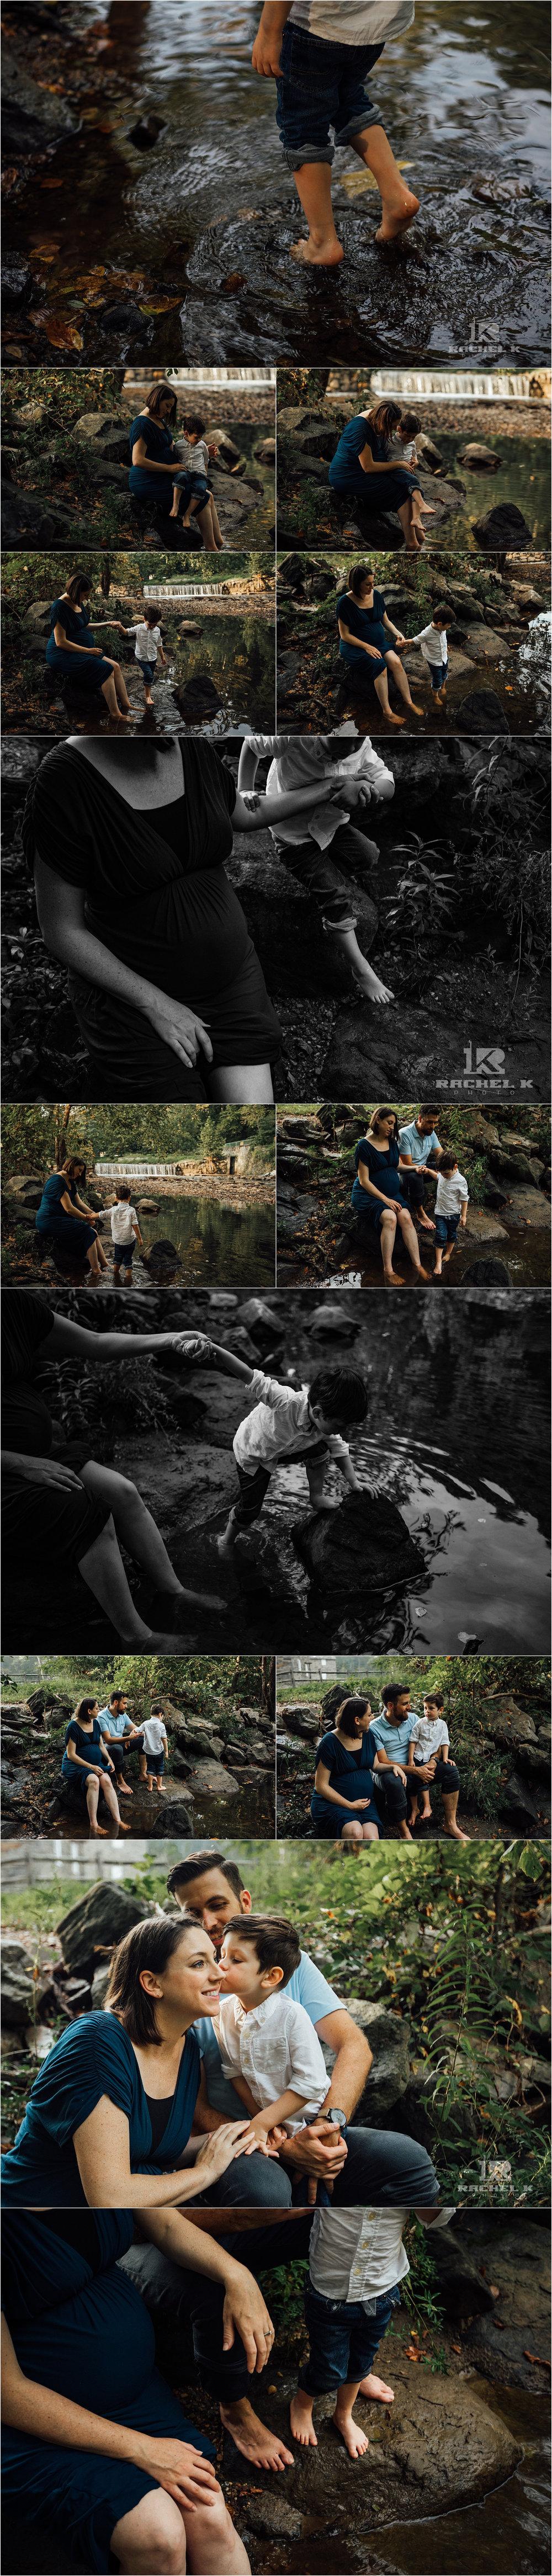 Rock creek park family session by Rachel K Photo